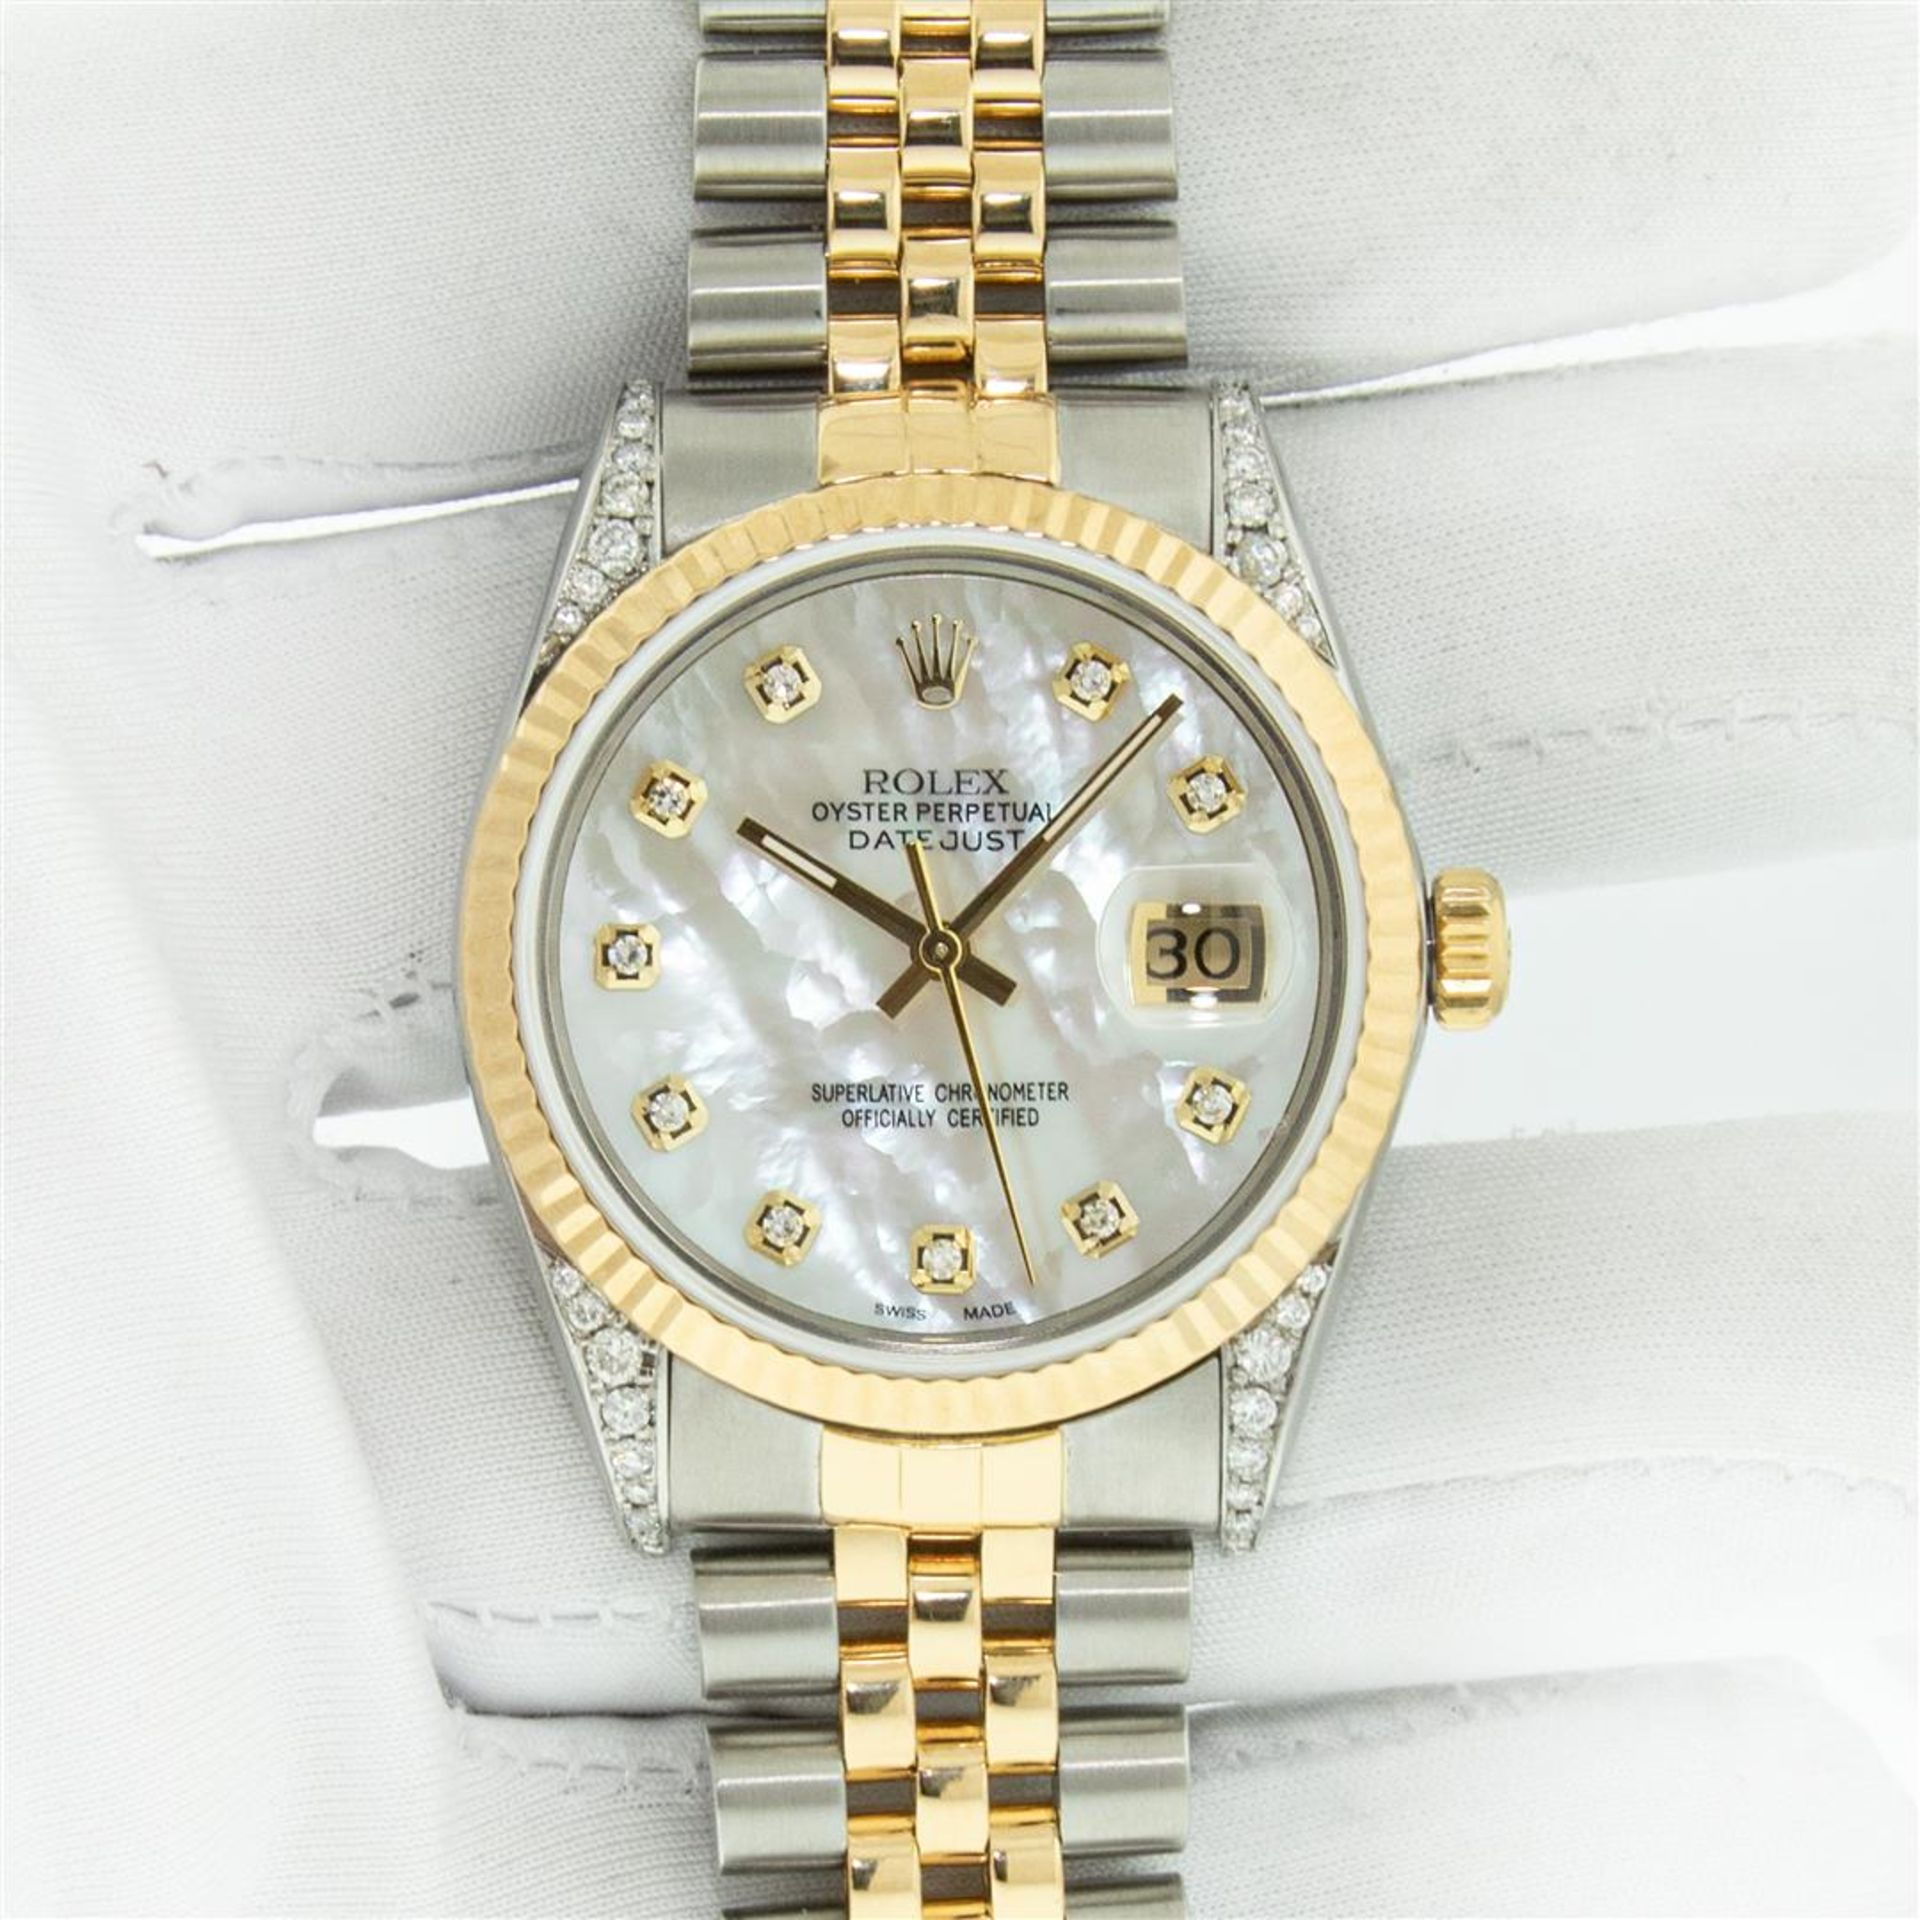 Rolex Mens 2 Tone MOP Diamond Lugs 36MM Datejust Wristwatch - Image 3 of 9